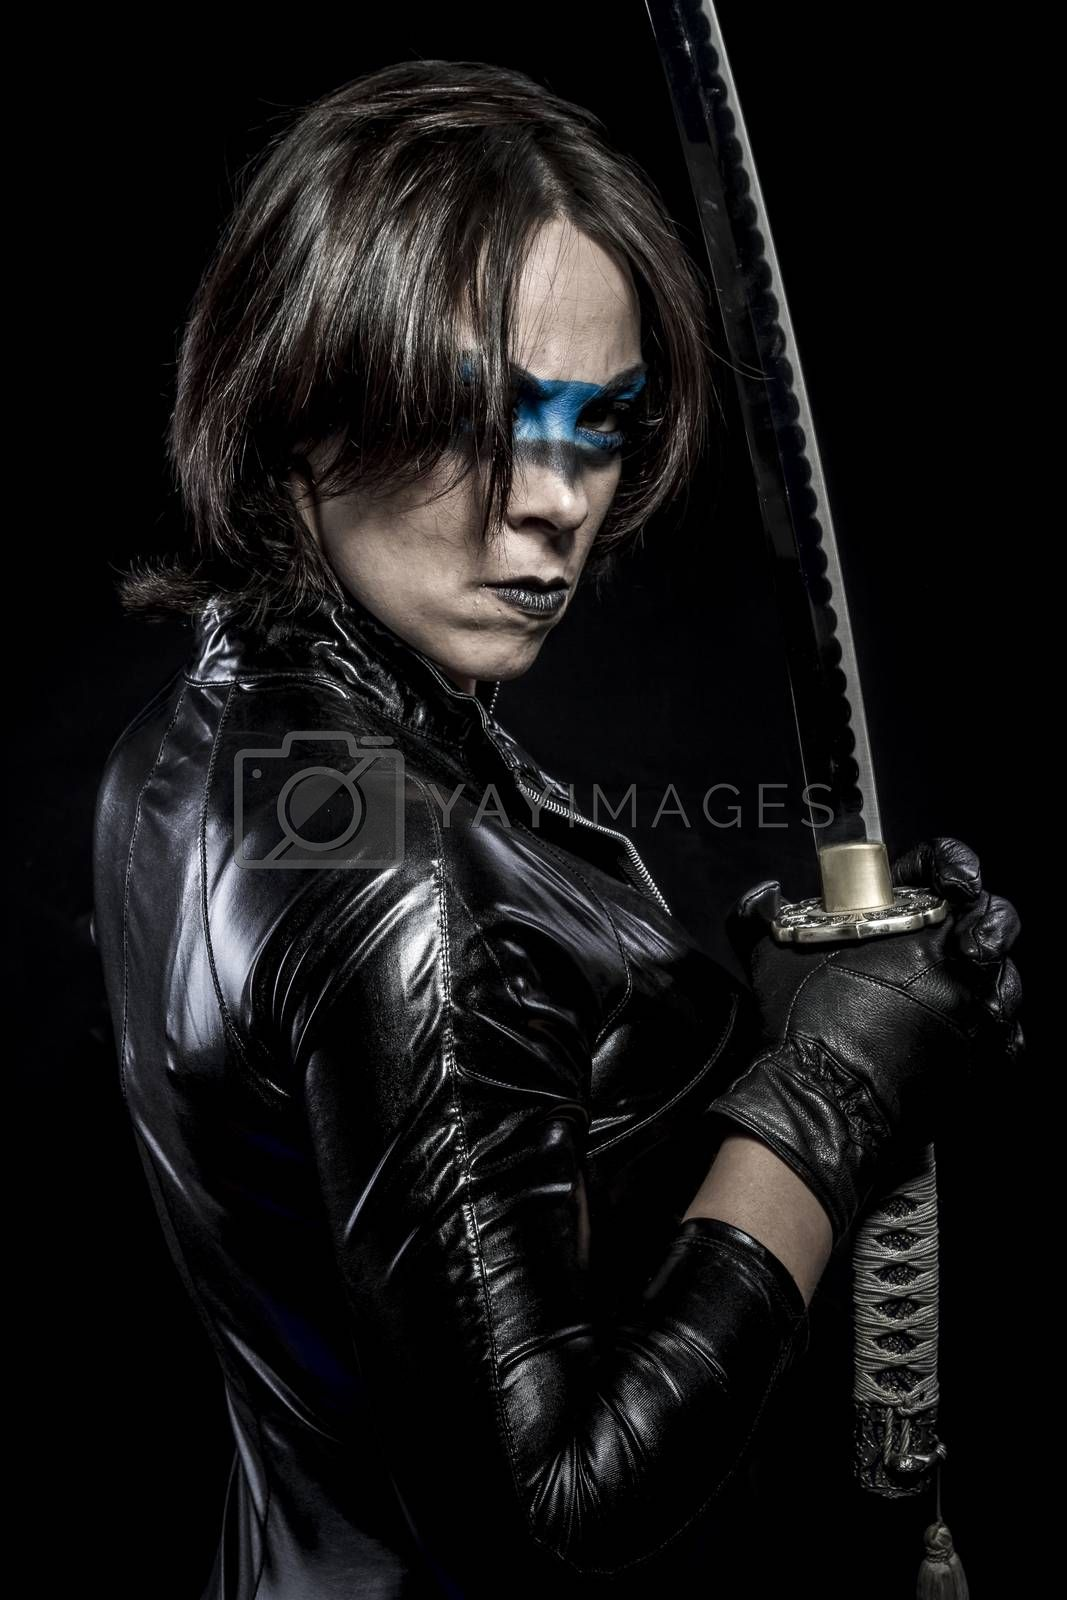 Woman with katana sword in latex costume